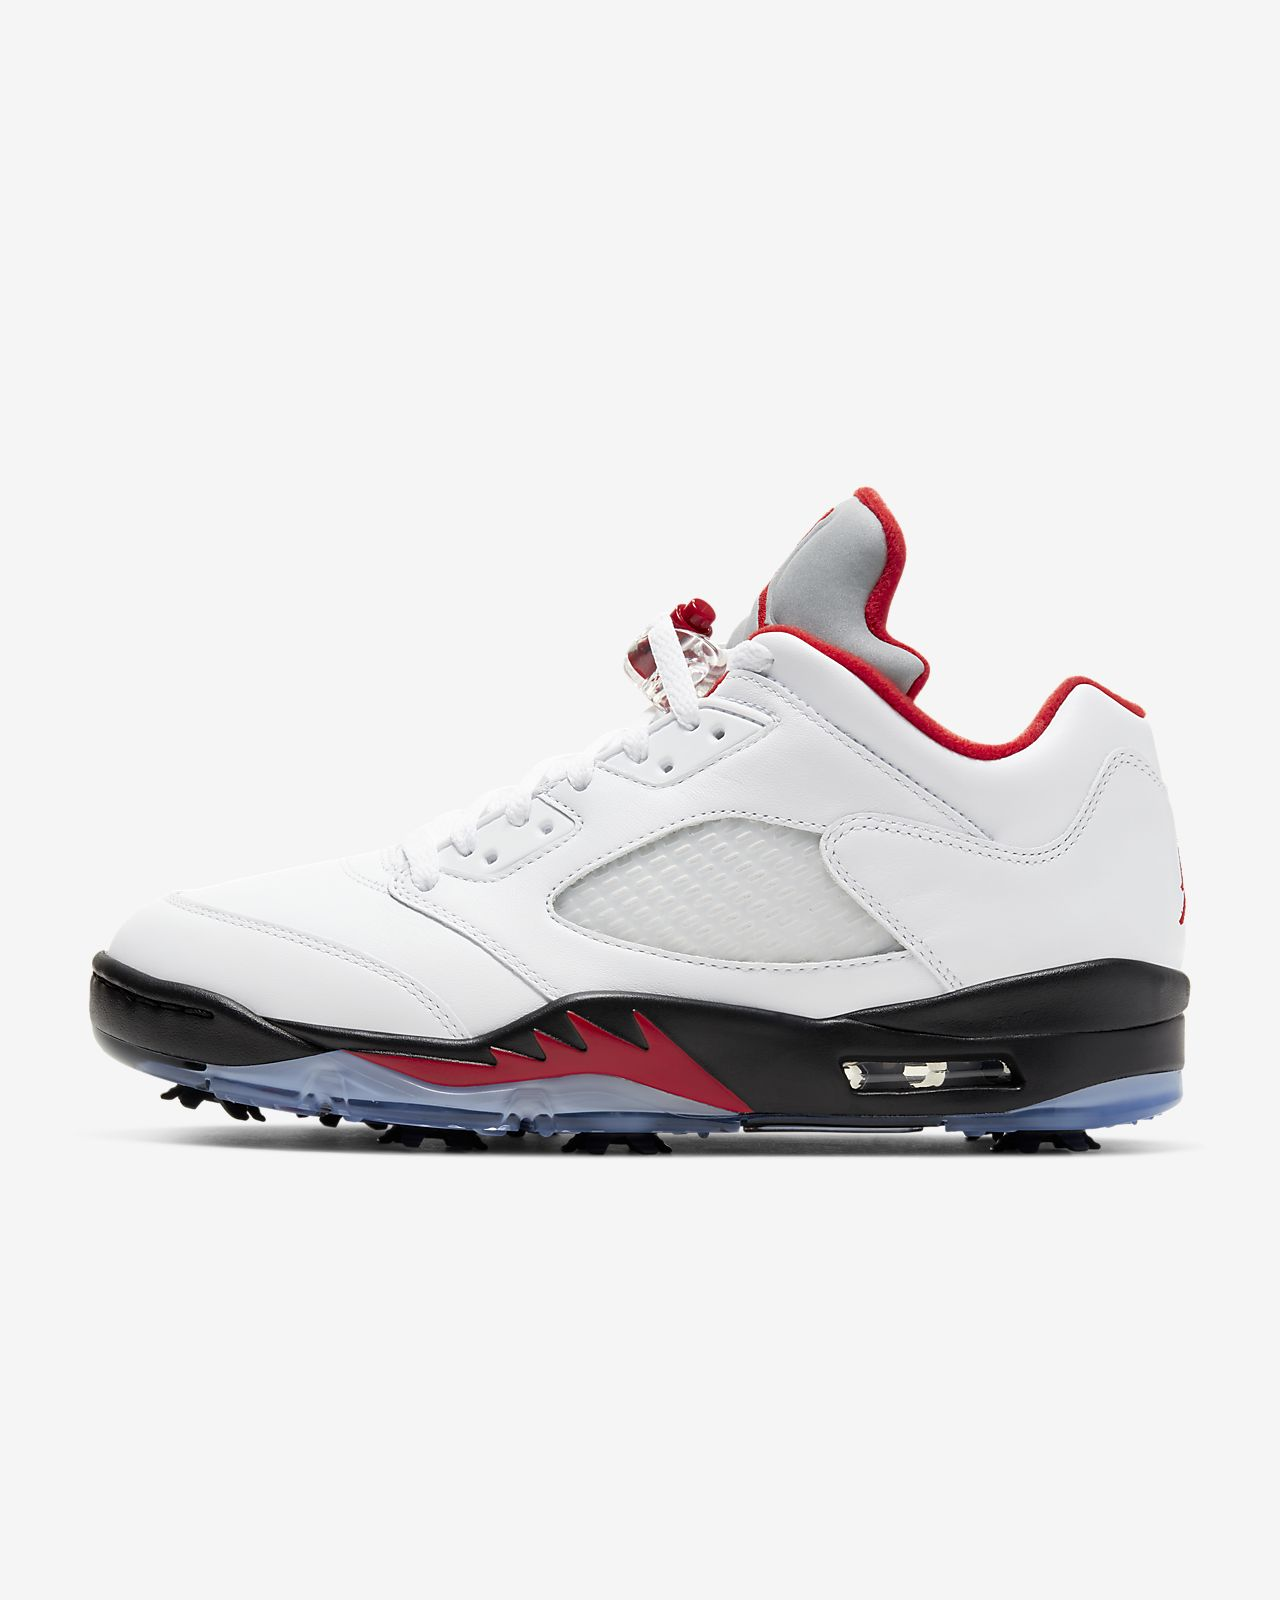 Chaussure de golf Air Jordan V Low